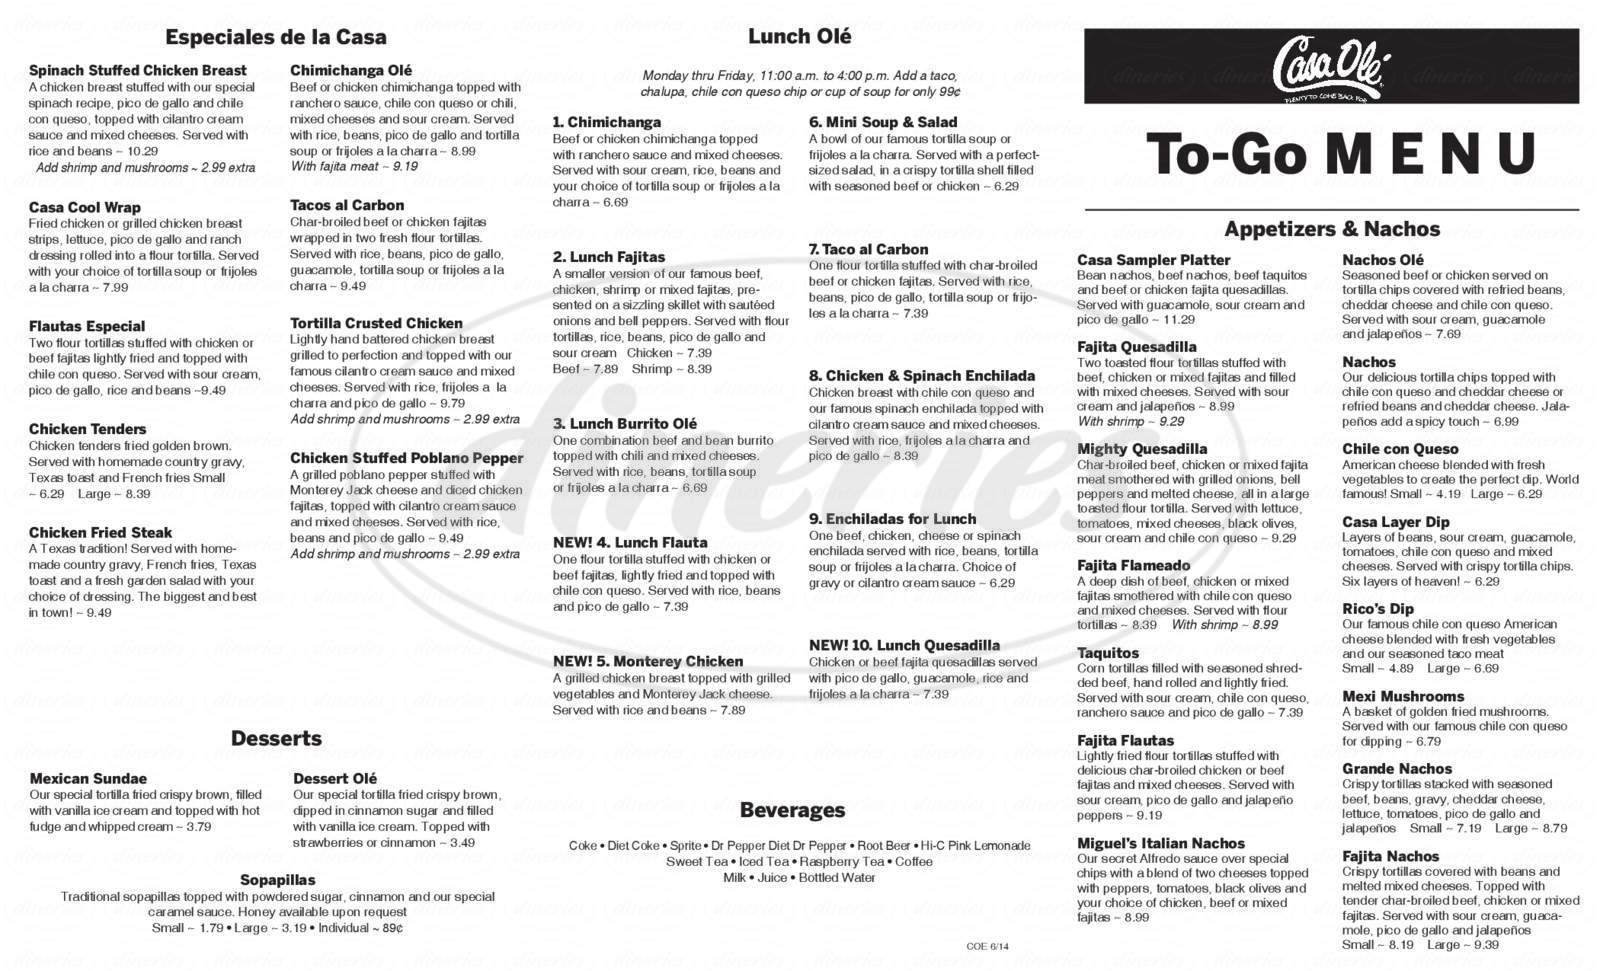 menu for Casa Olé Mexican Restaurant